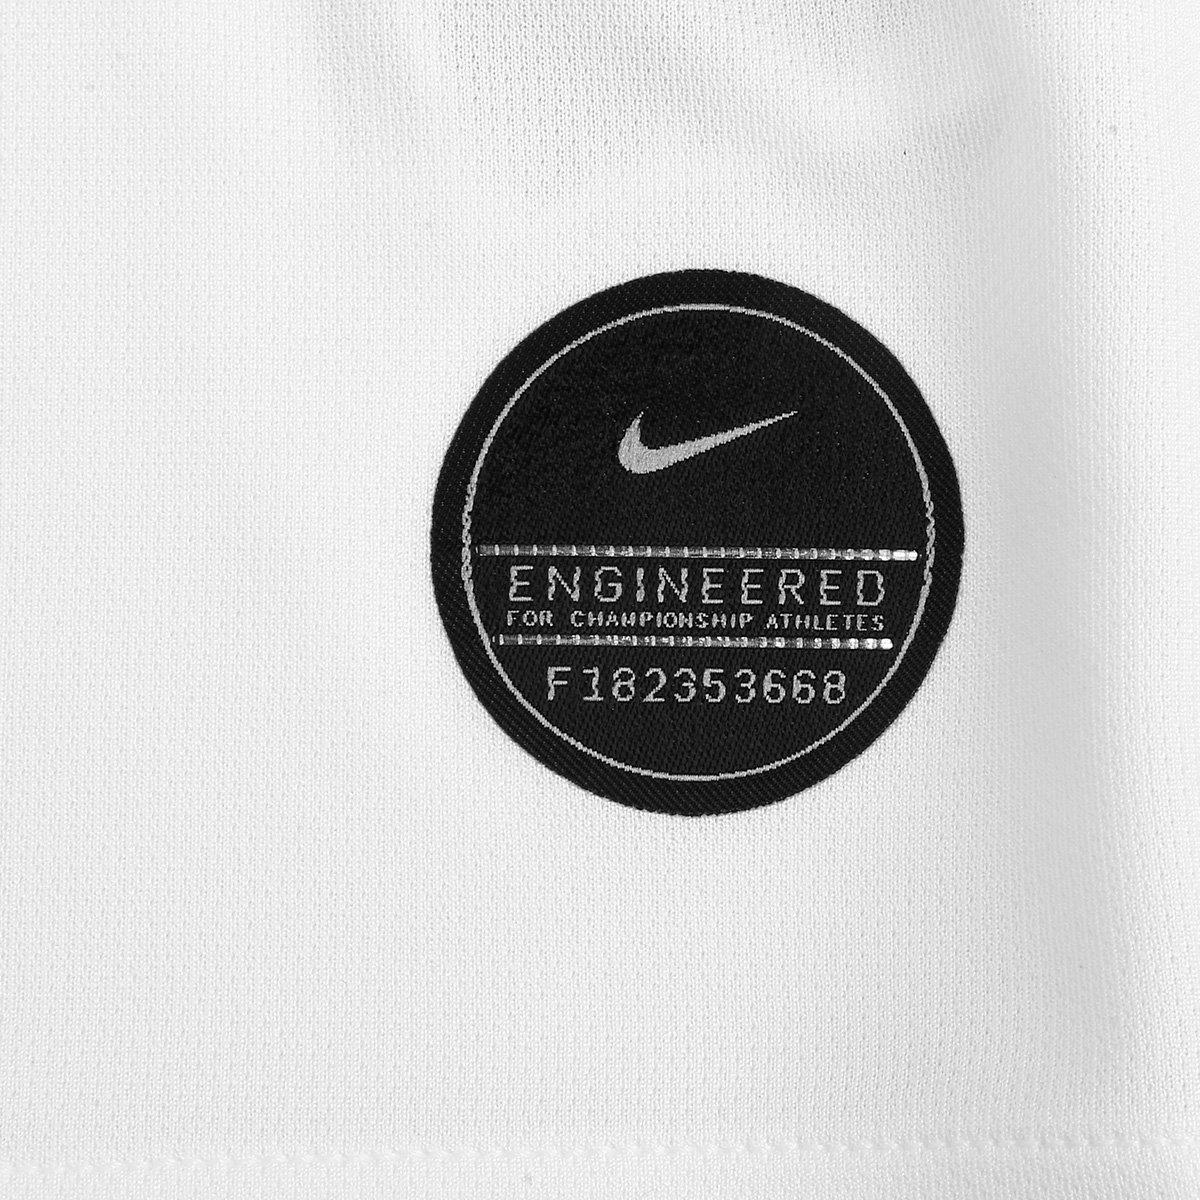 Camisa Seleção Brasil III 19/20 s/nº Torcedor Nike Masculina - Tam: M - 4